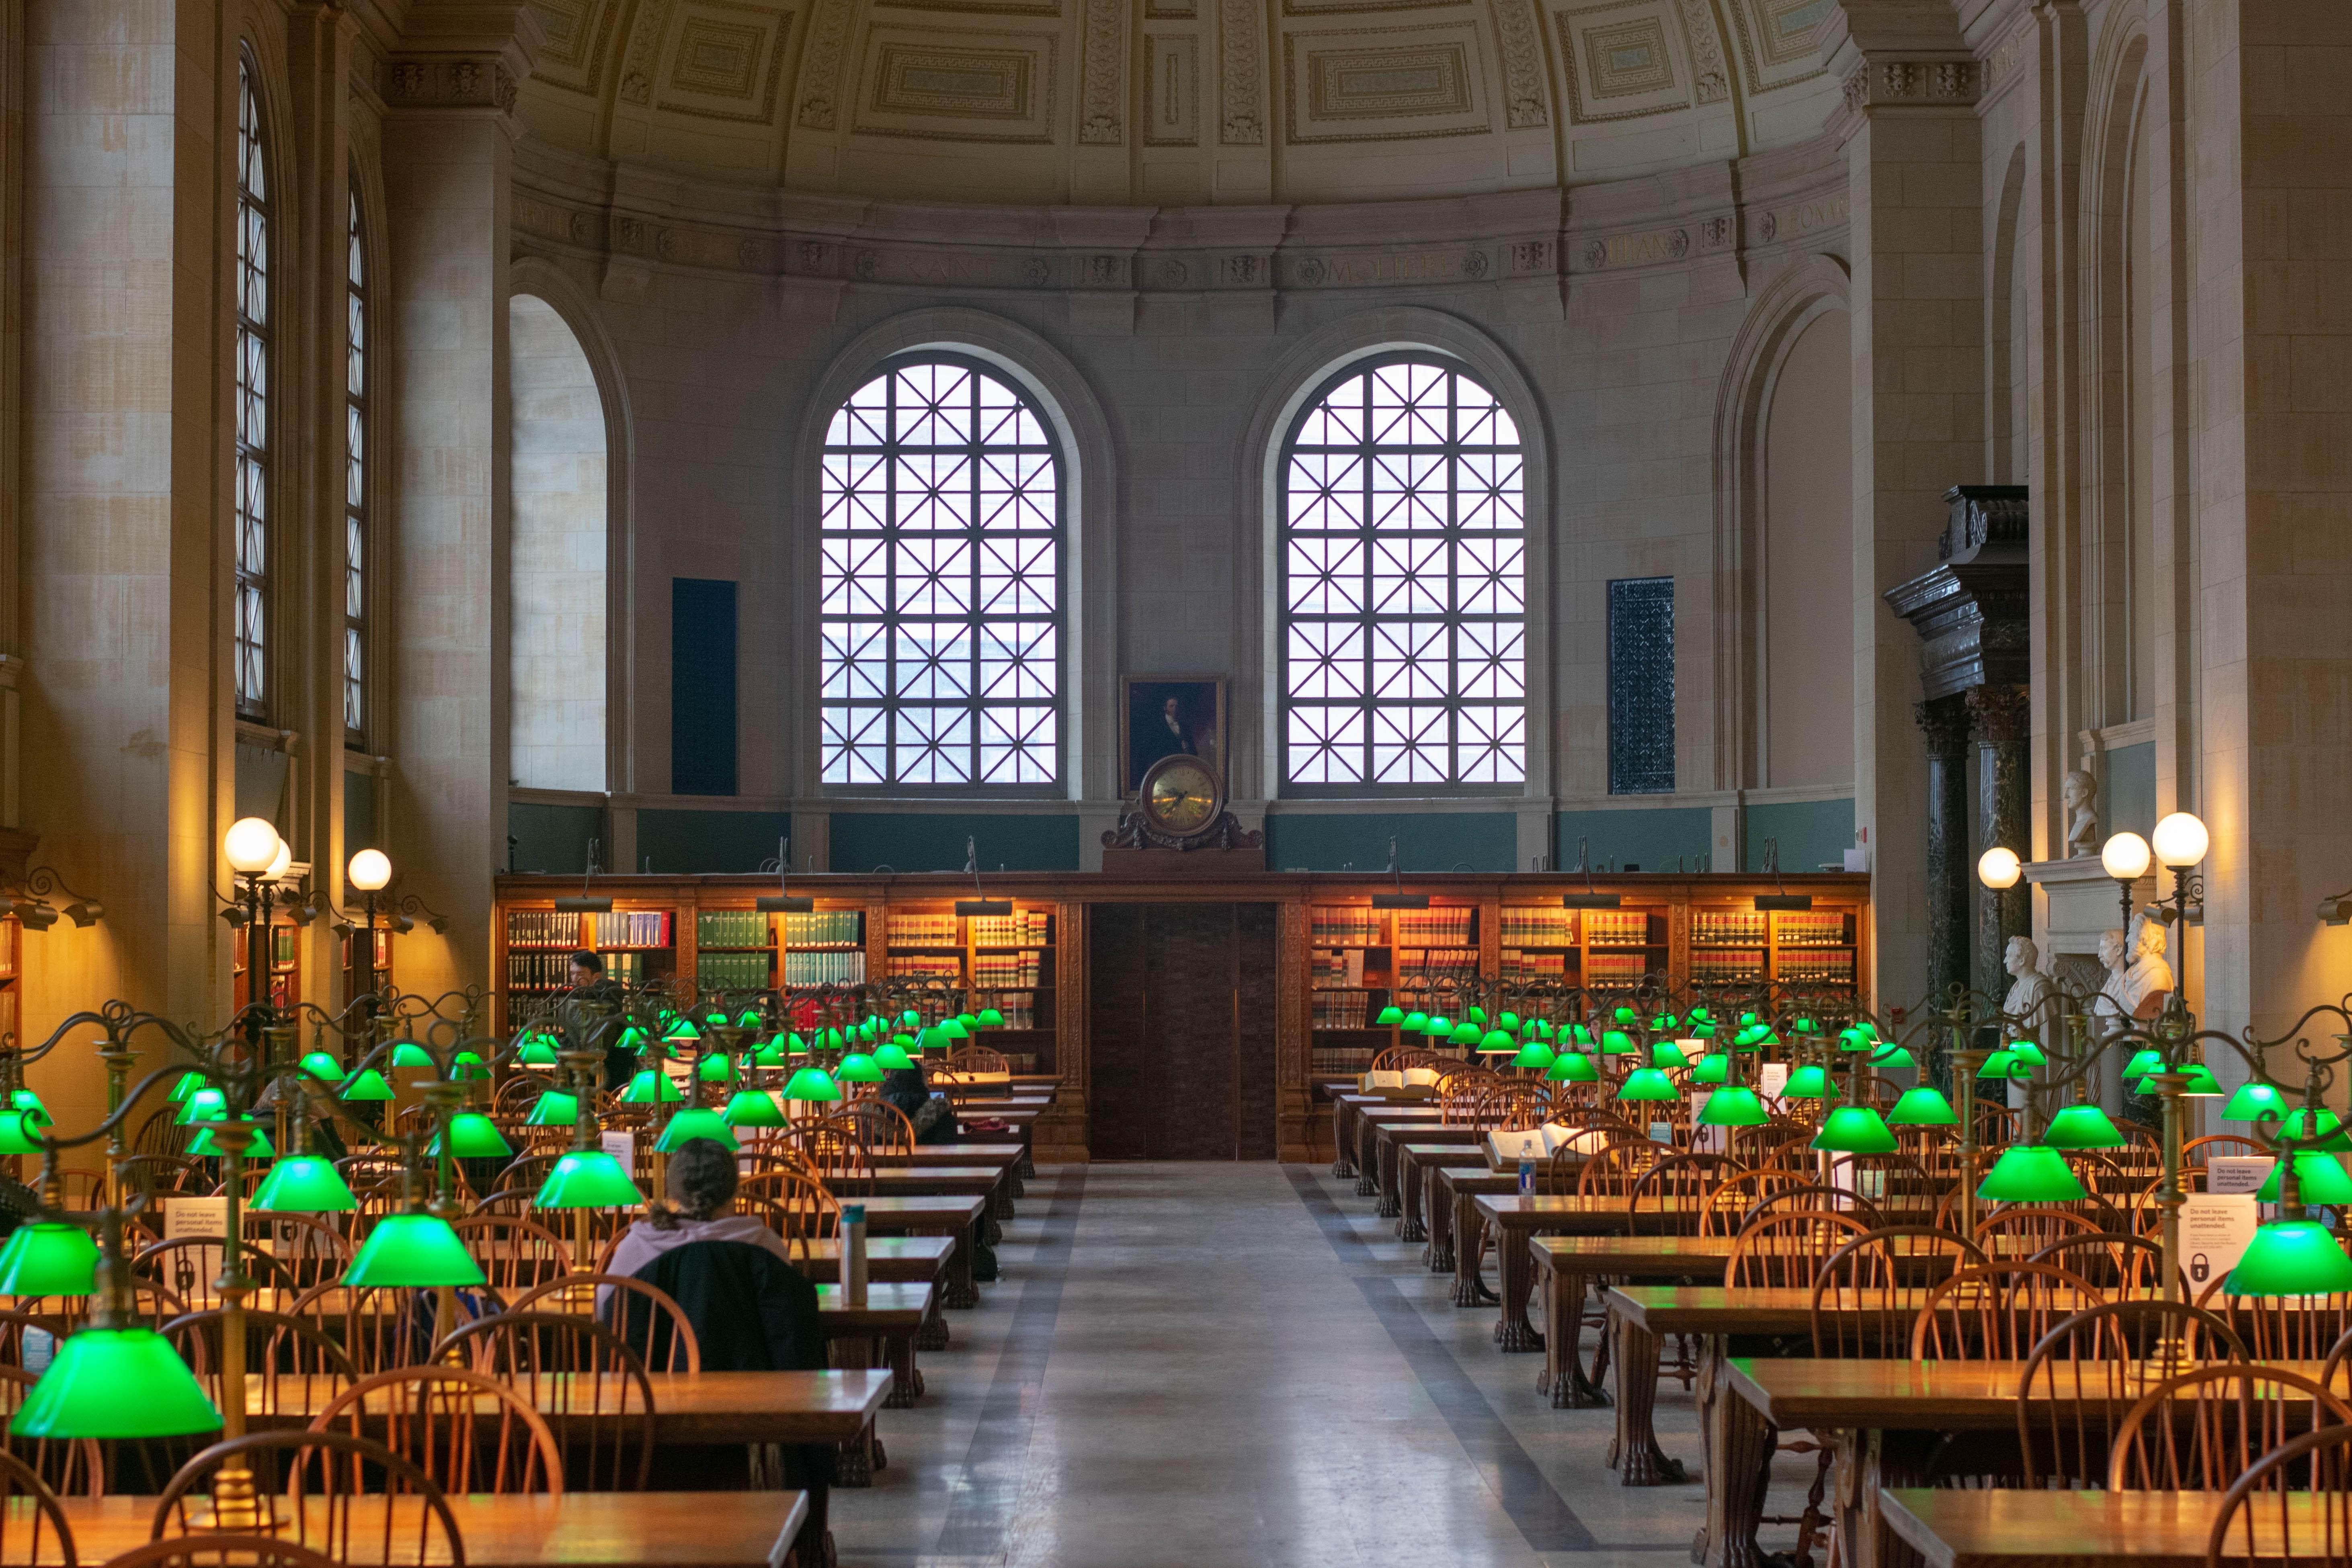 A study room at the Boston Public Library. Photo courtesy of Daniel Brubaker on Unsplash.